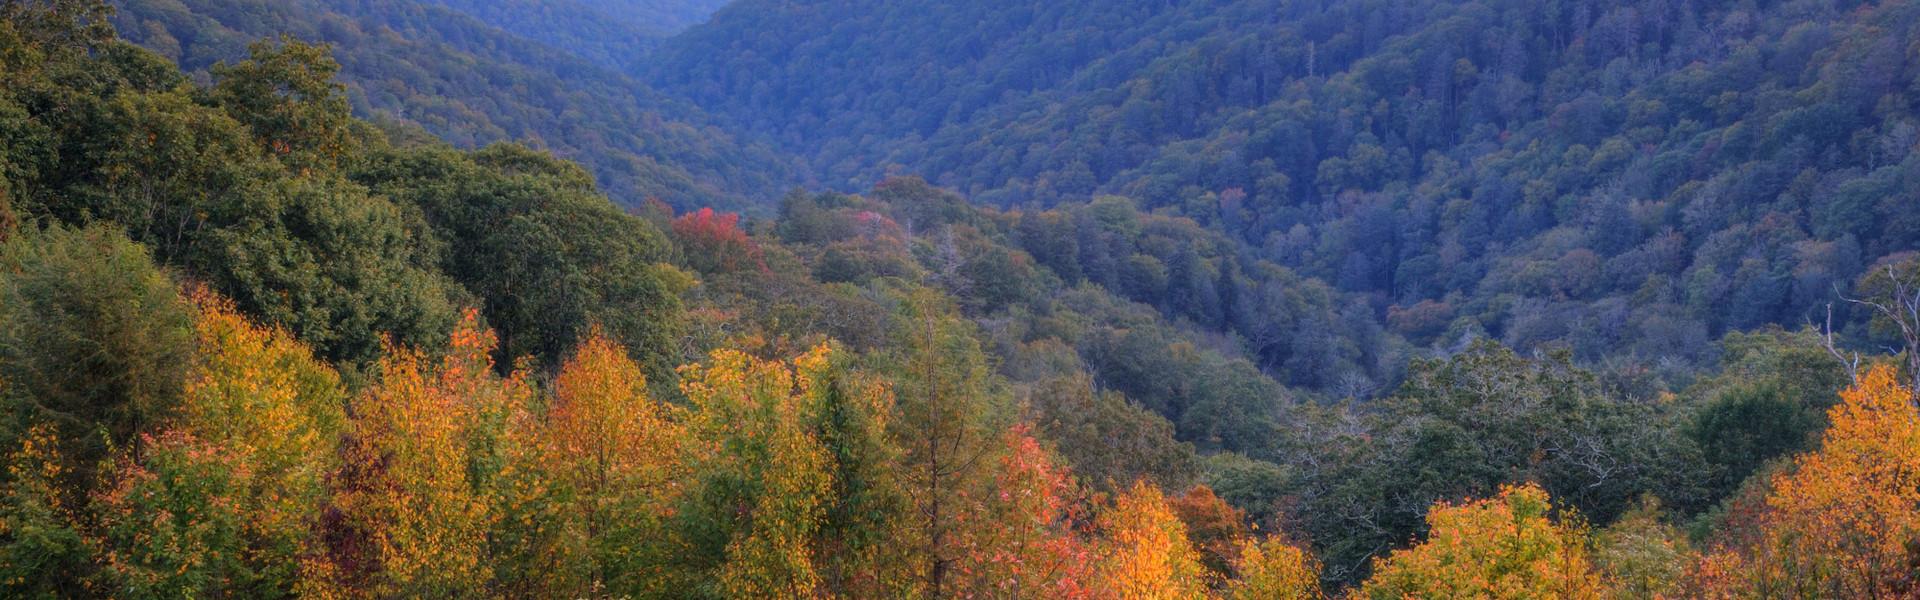 Gatlinburg Hotel Discount Rates | Mountain View